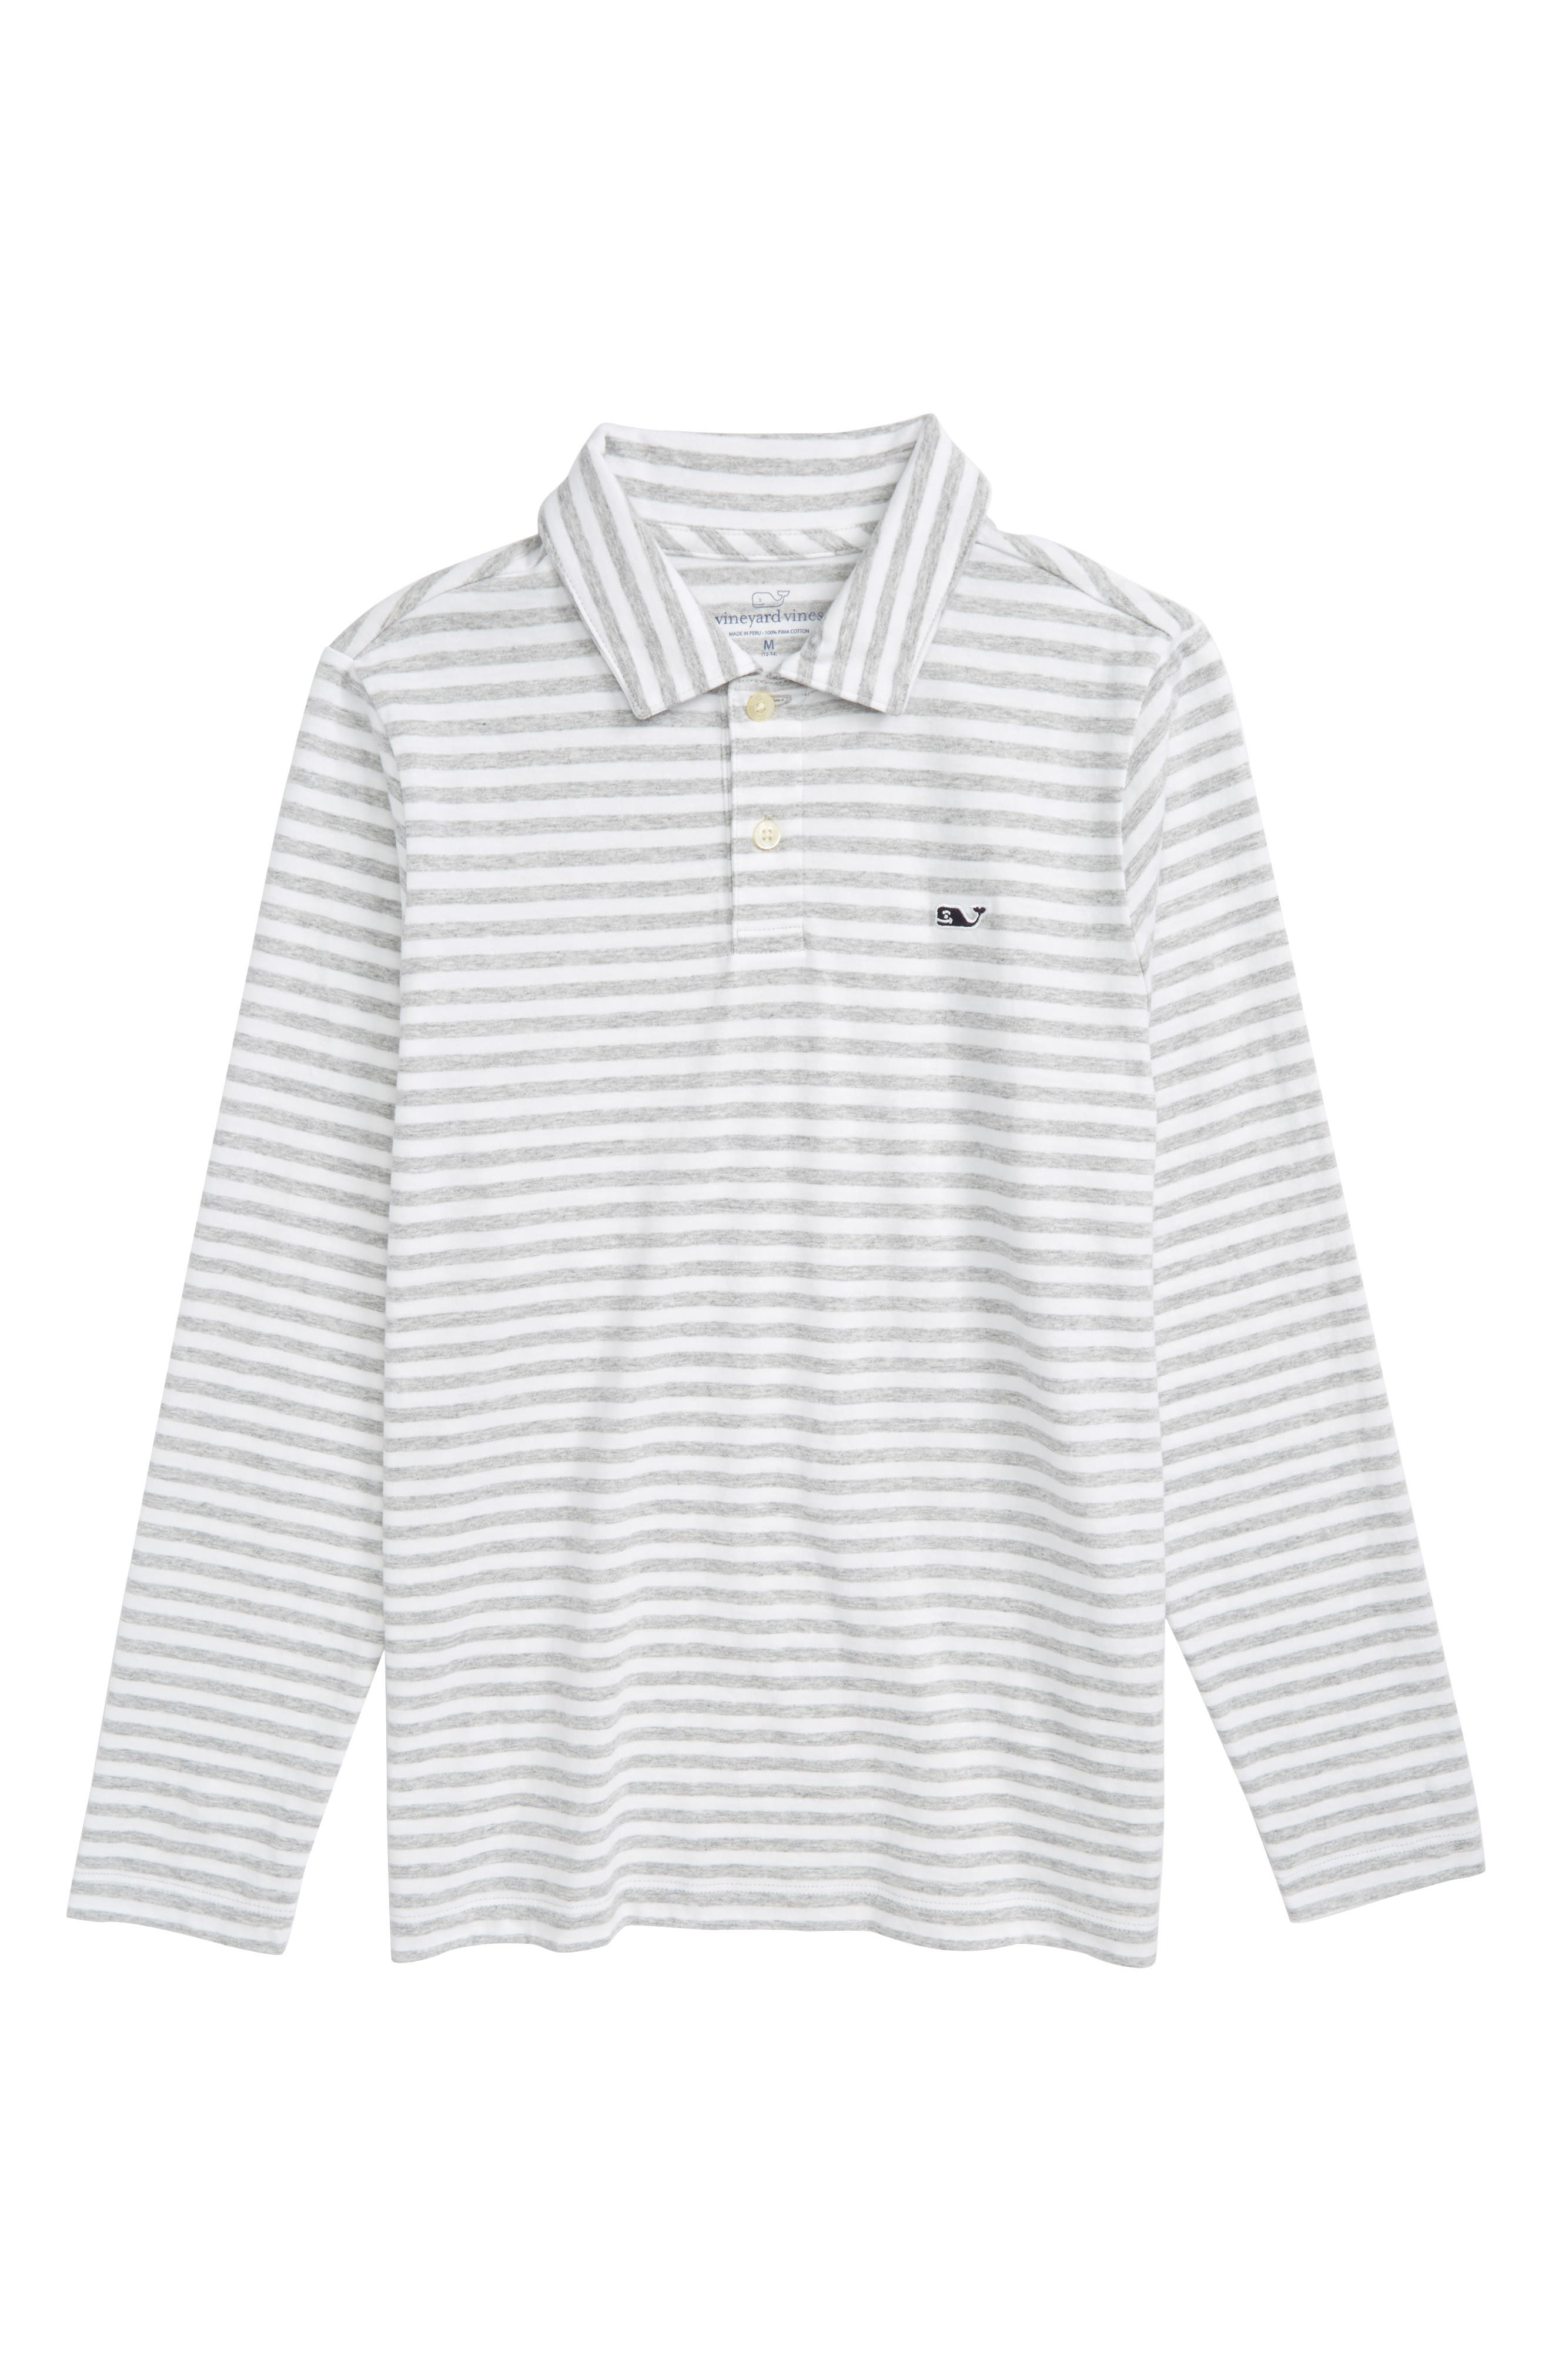 Main Image - vineyard vines Stripe Pima Cotton Jersey Polo (Toddler Boys & Little Boys)